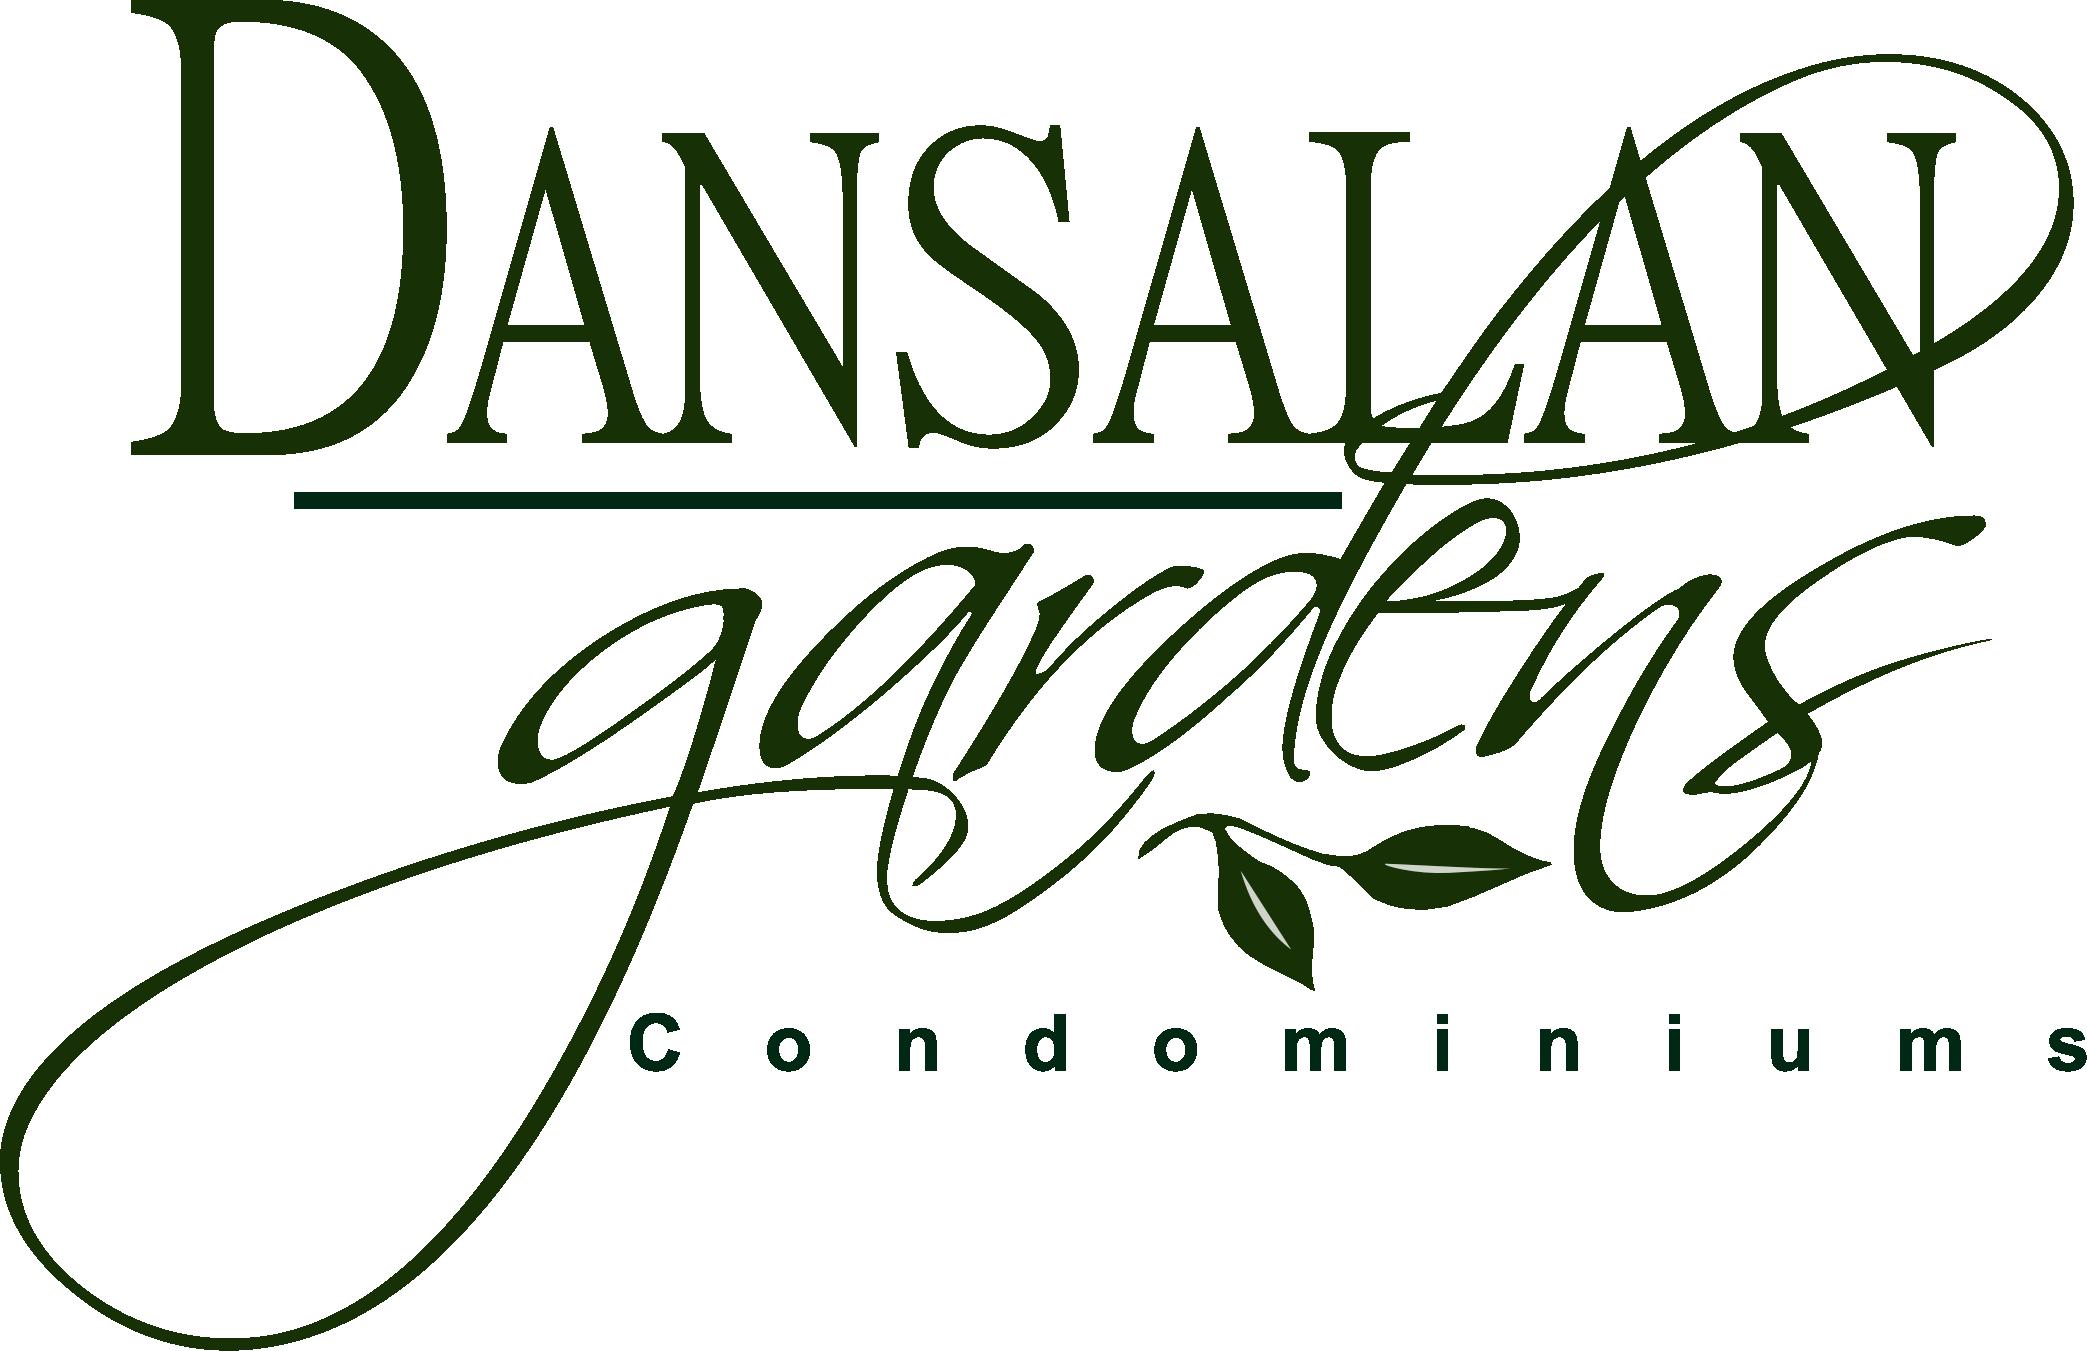 Dansalan Gardens property logo